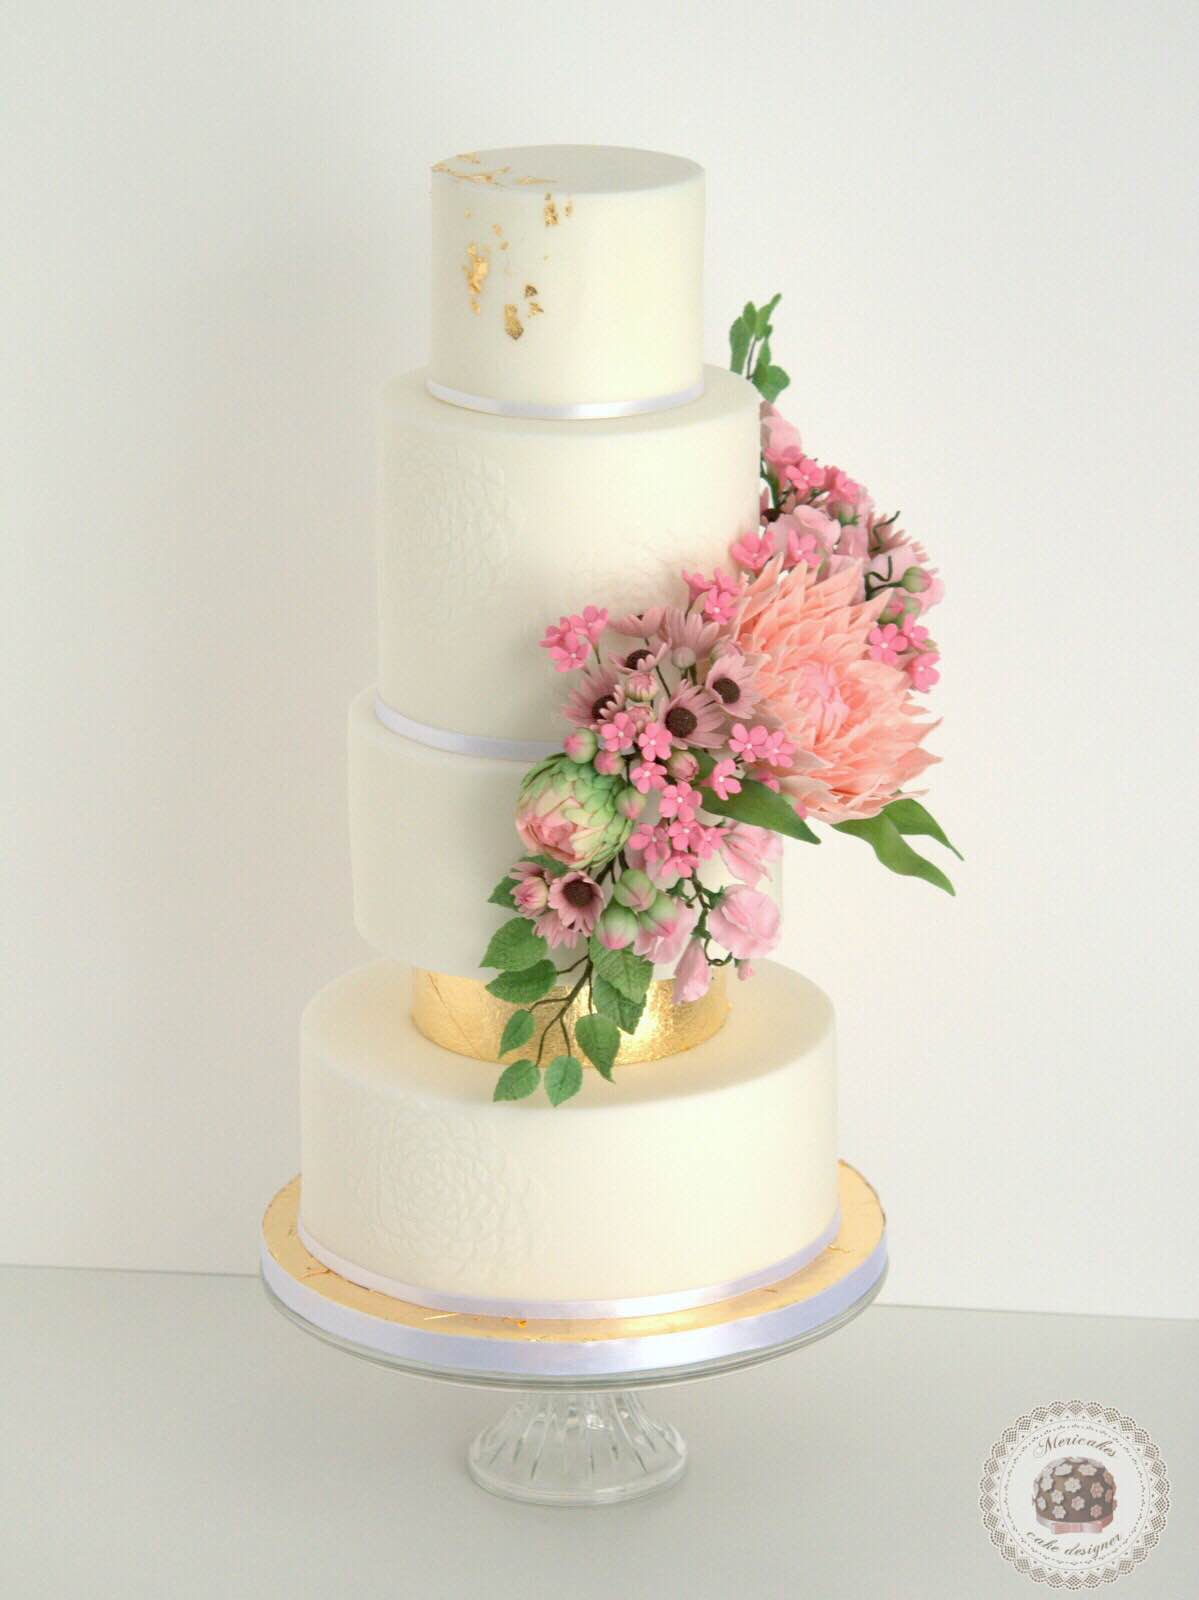 wedding-cake-spring-blooms-mericakes-barcelona-tarta-de-boda-gold-leaf-sugar-flowers-dahlia-sweet-pea-fondant-daisy-20